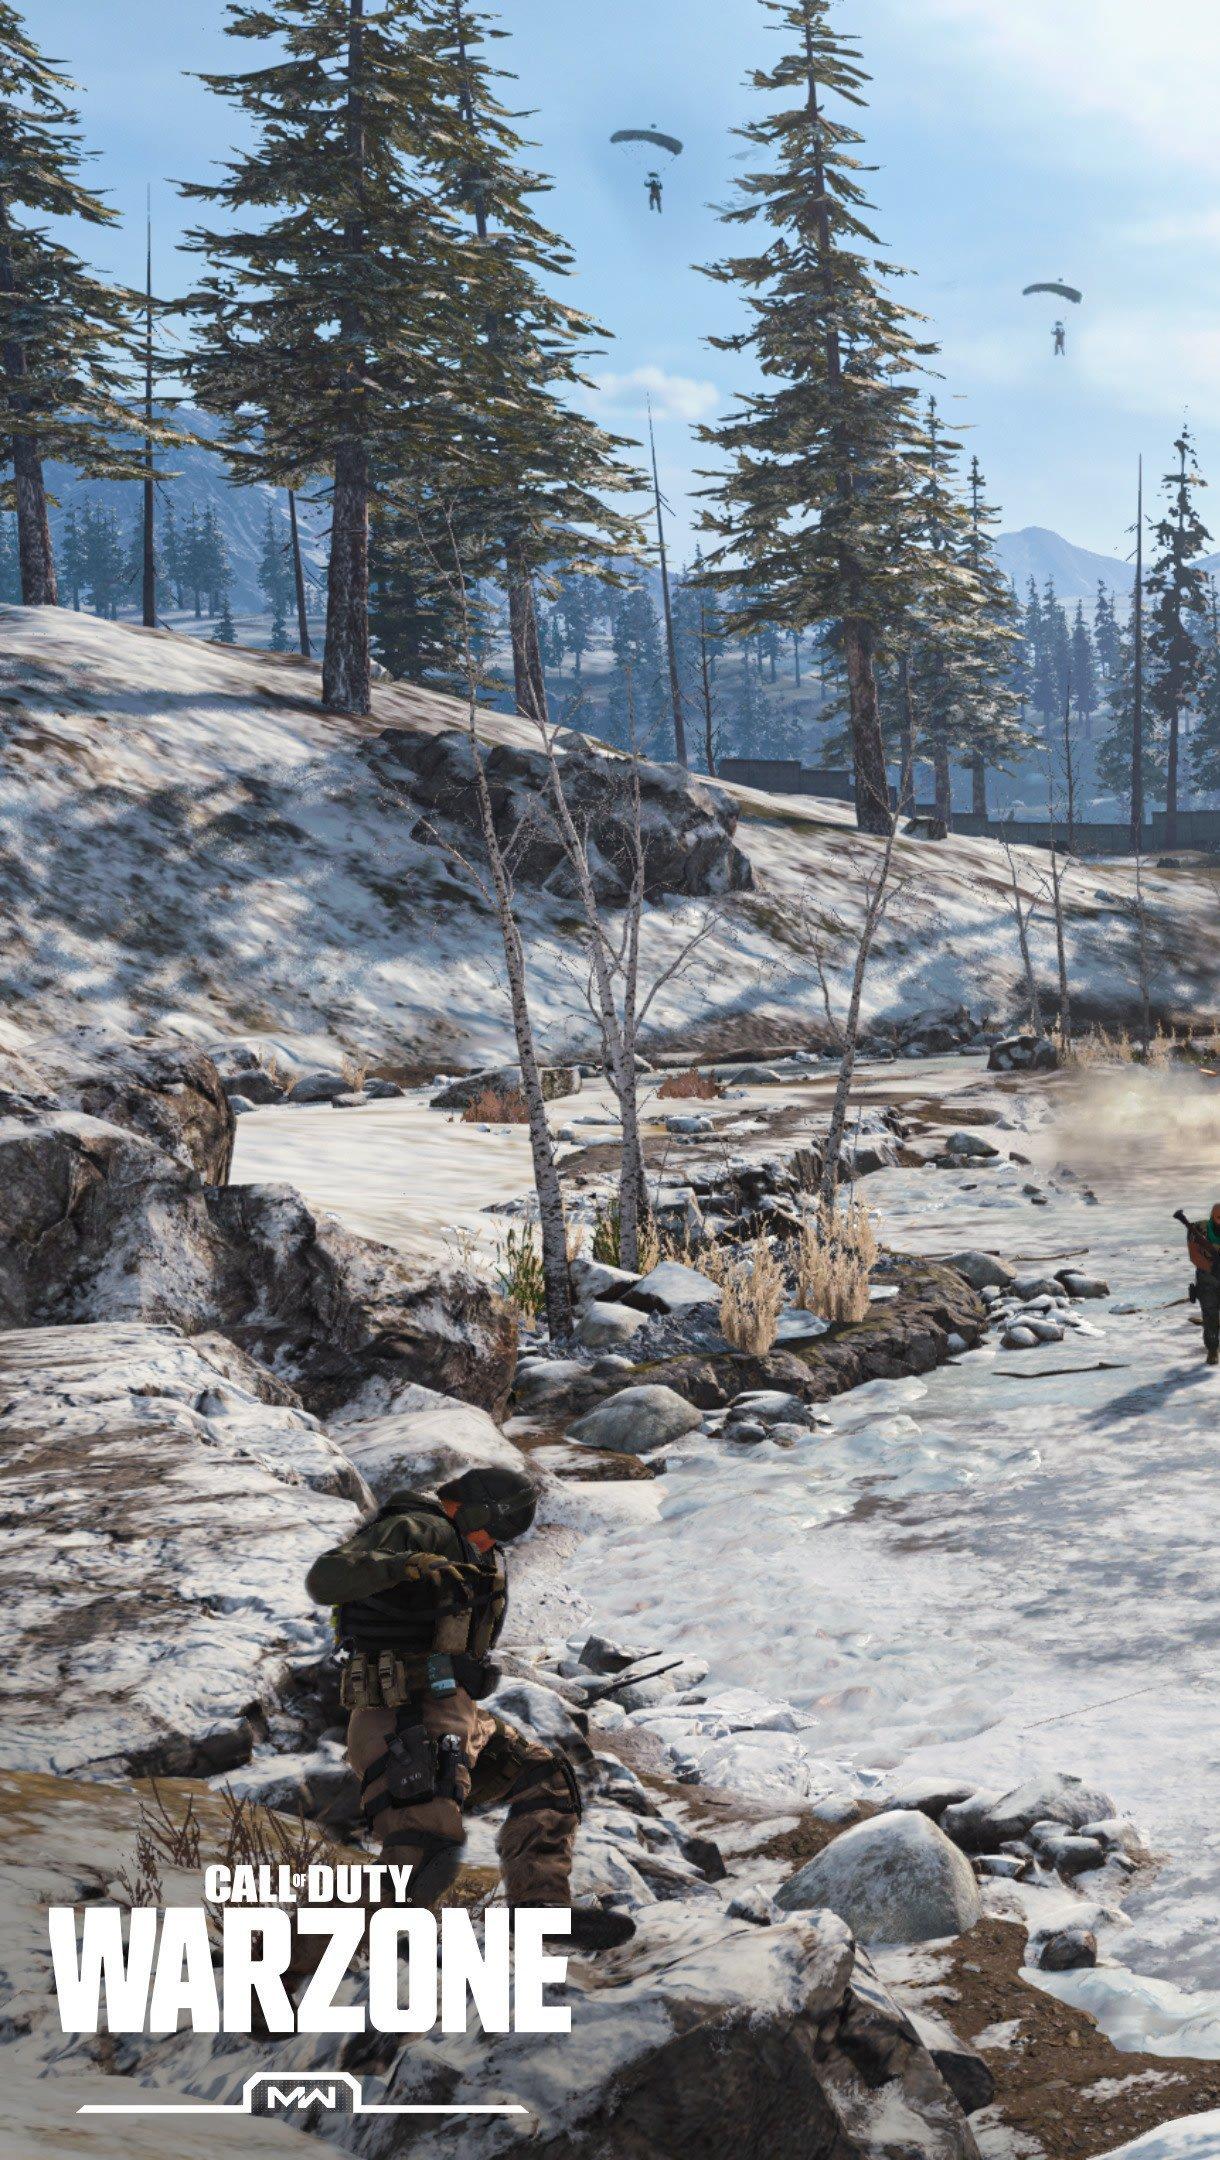 Call Of Duty Warzone Wallpaper 4k Ultra Hd Id 5037